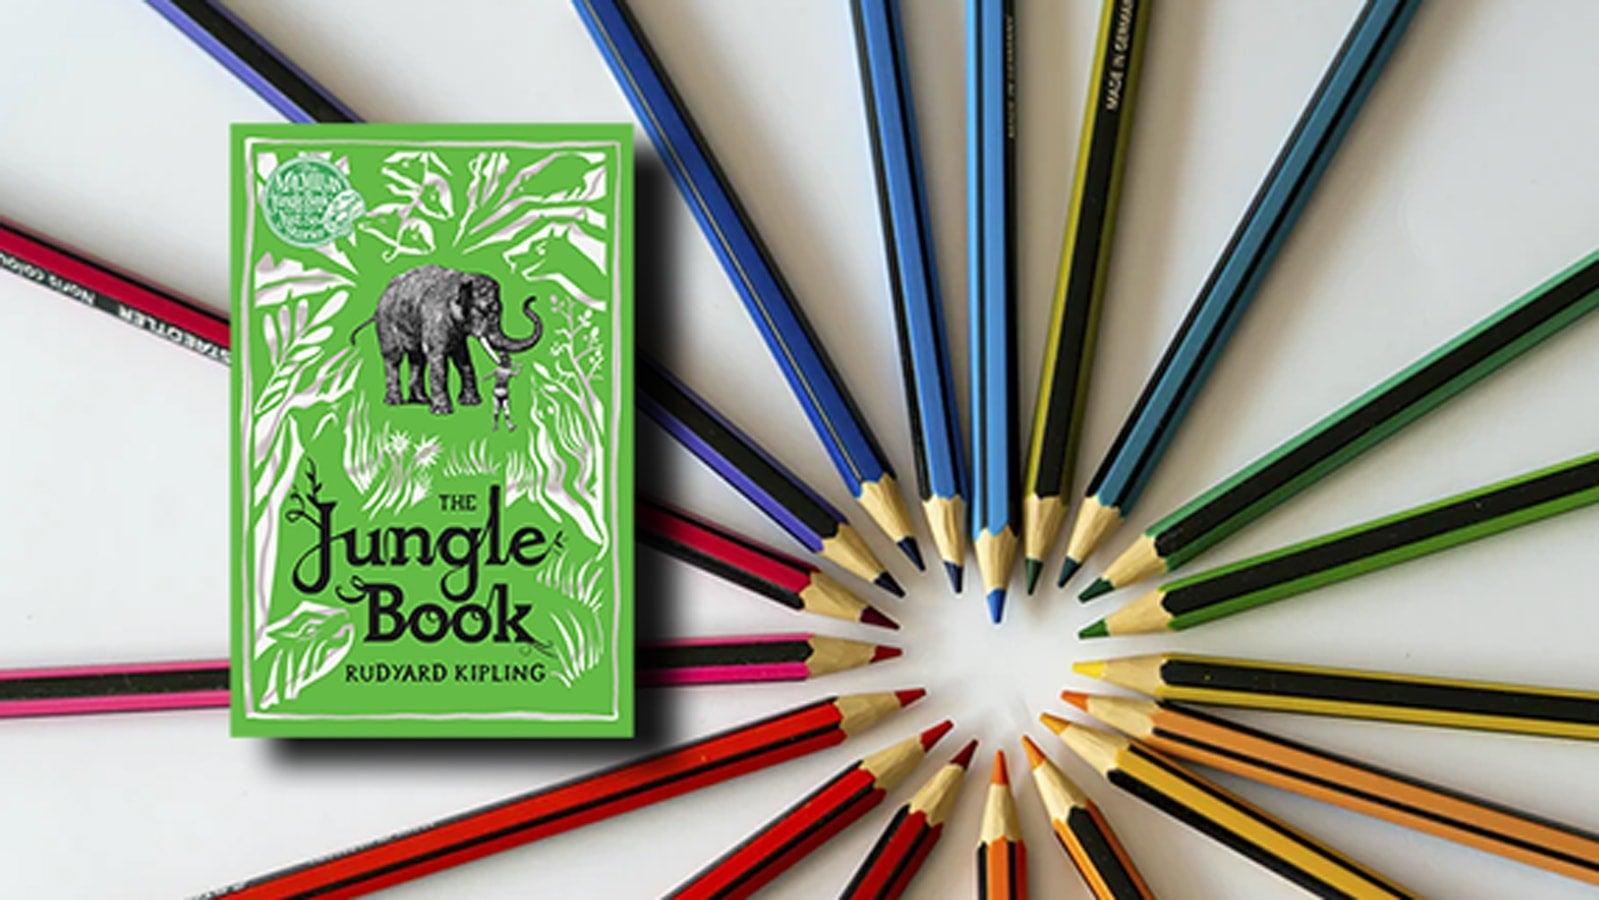 the-jungle-book-acitvity-sheet-header-min.jpg